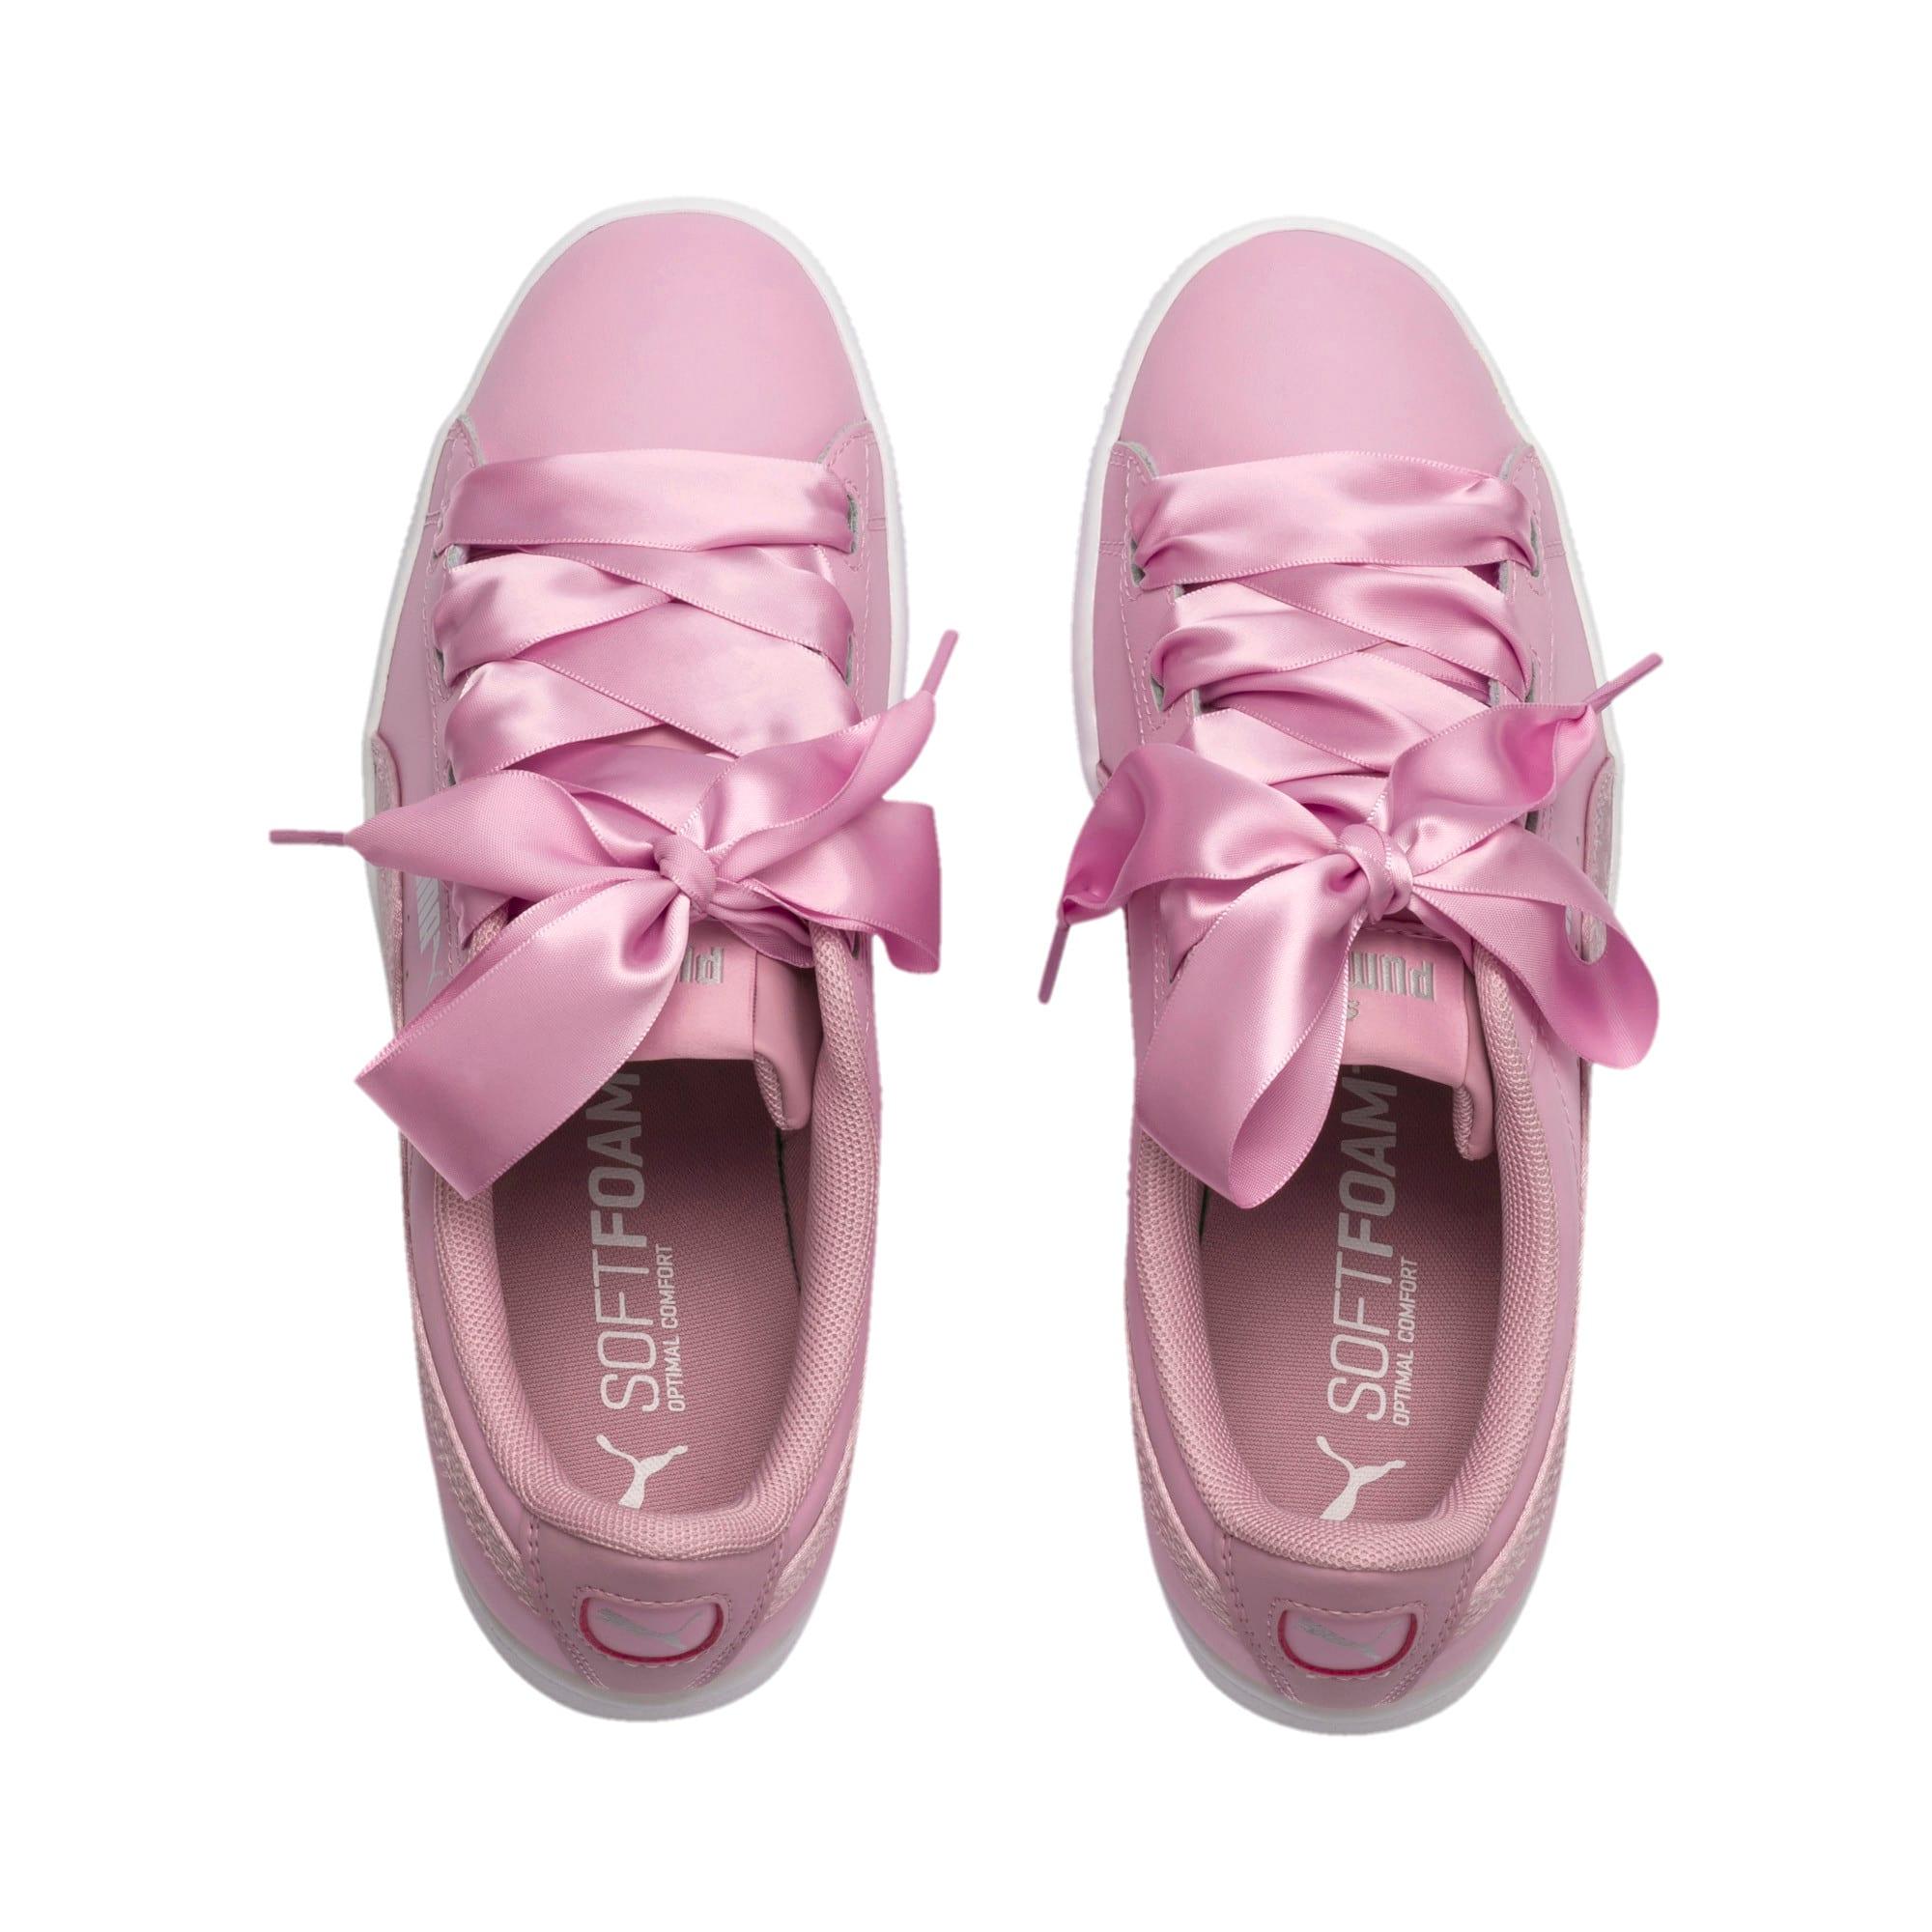 Thumbnail 6 of PUMA Vikky Ribbon Satin Sneakers JR, Pale Pink-Pale Pink, medium